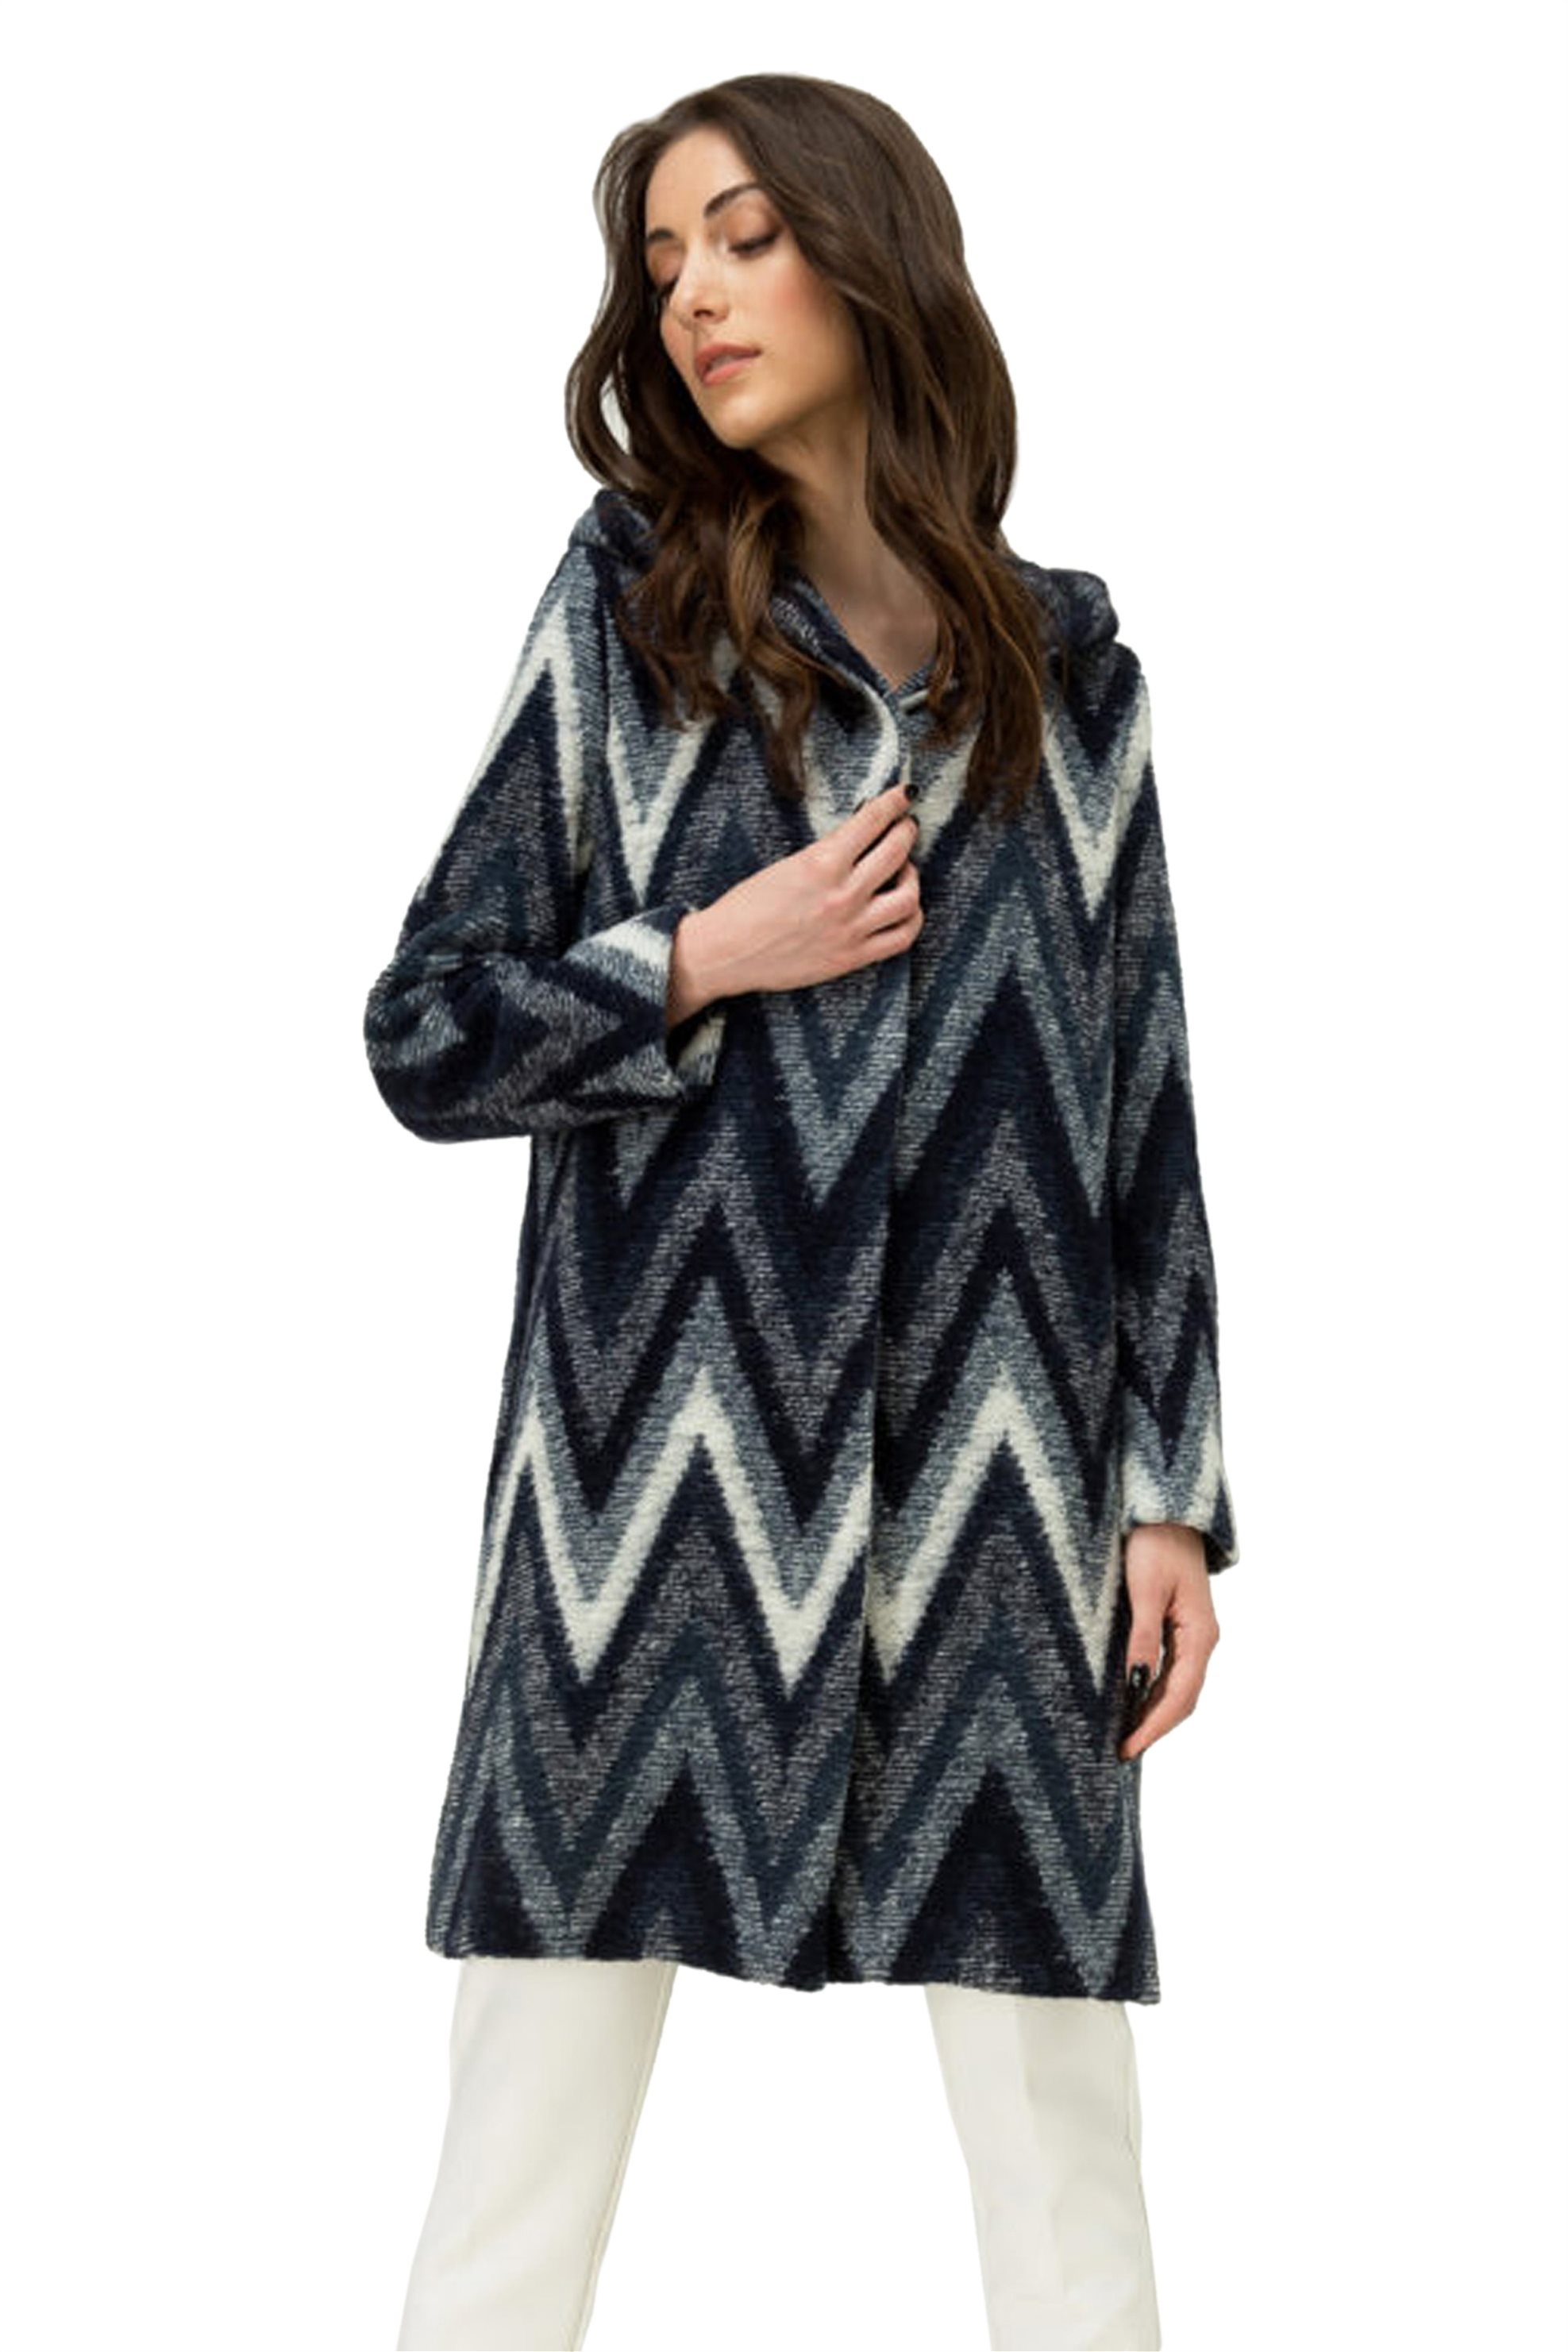 Billy Sabbado γυναικείο μίντι παλτό με γεωμετρικό σχέδιο - 0143833607 - Μπλε Σκο γυναικα   ρουχα   πανωφόρια   μίντι παλτό